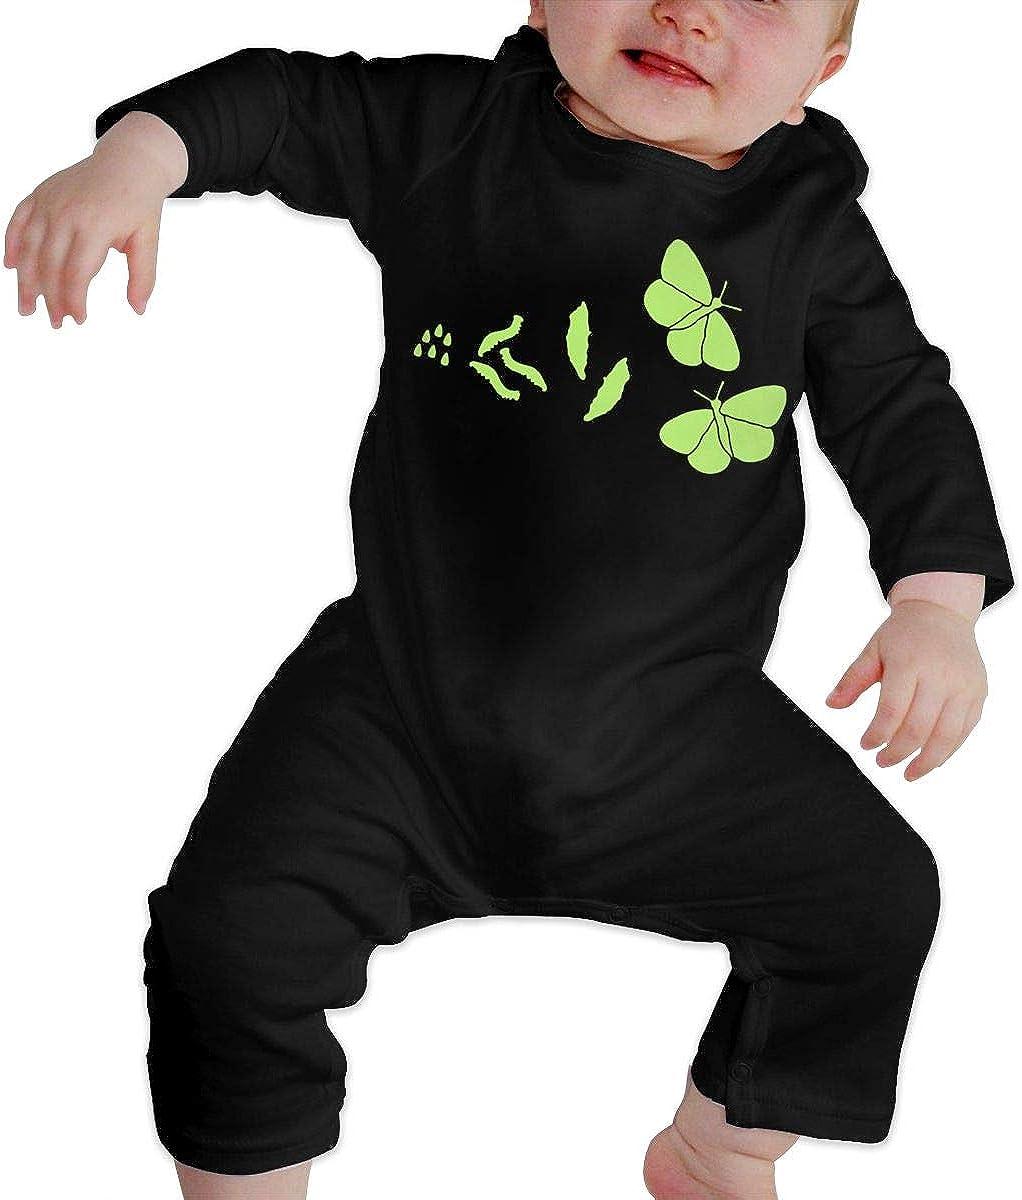 Butterfly Evolution Baby Jersey Bodysuit Cotton Bodysui